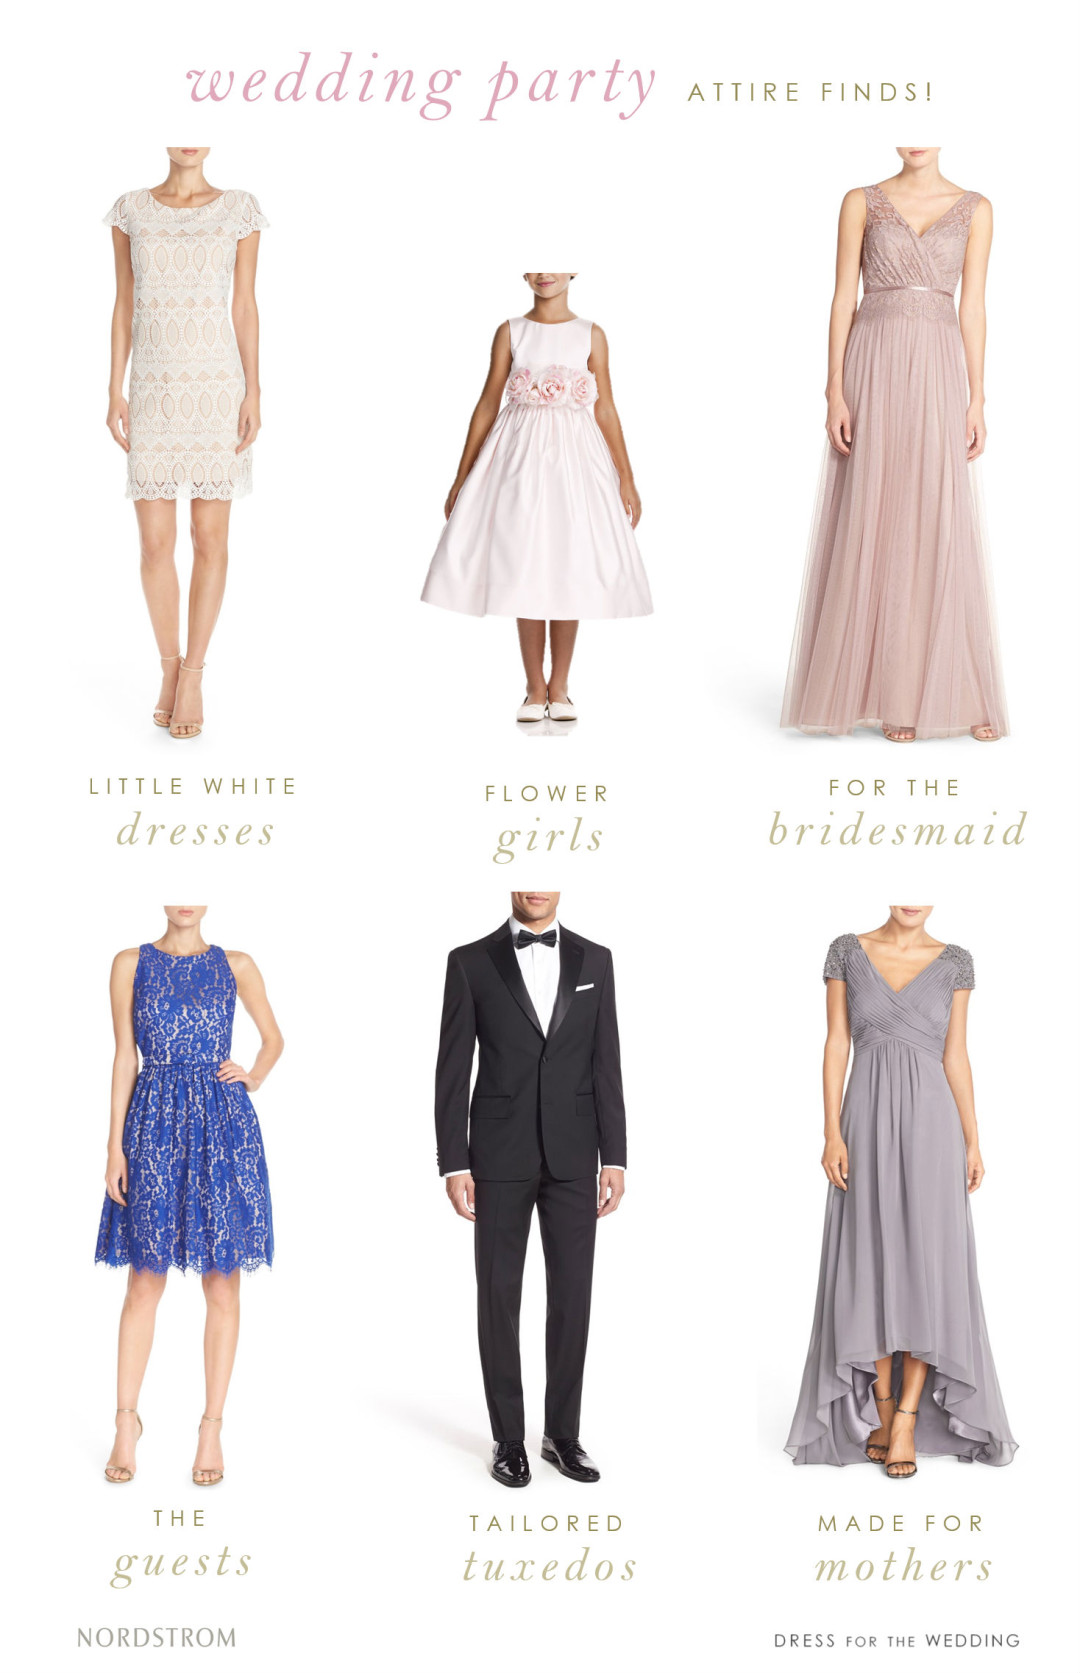 Where to find pretty wedding attire | Nordstrom Weddings